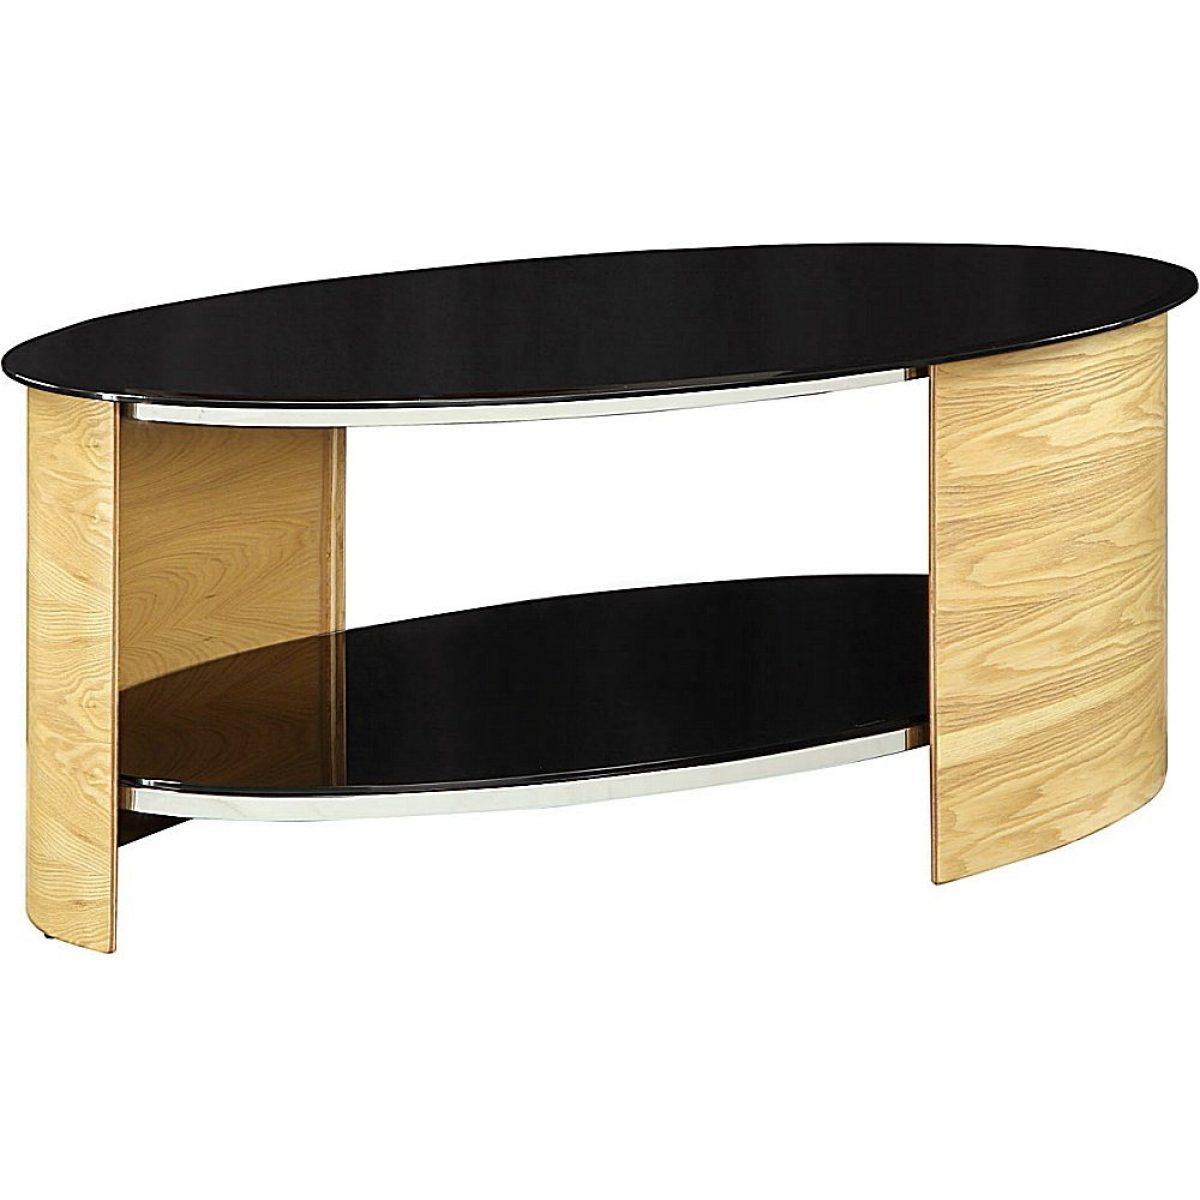 Jual San Marino Jf301 Ob Curve Oak And Black Glass Oval Coffee Table